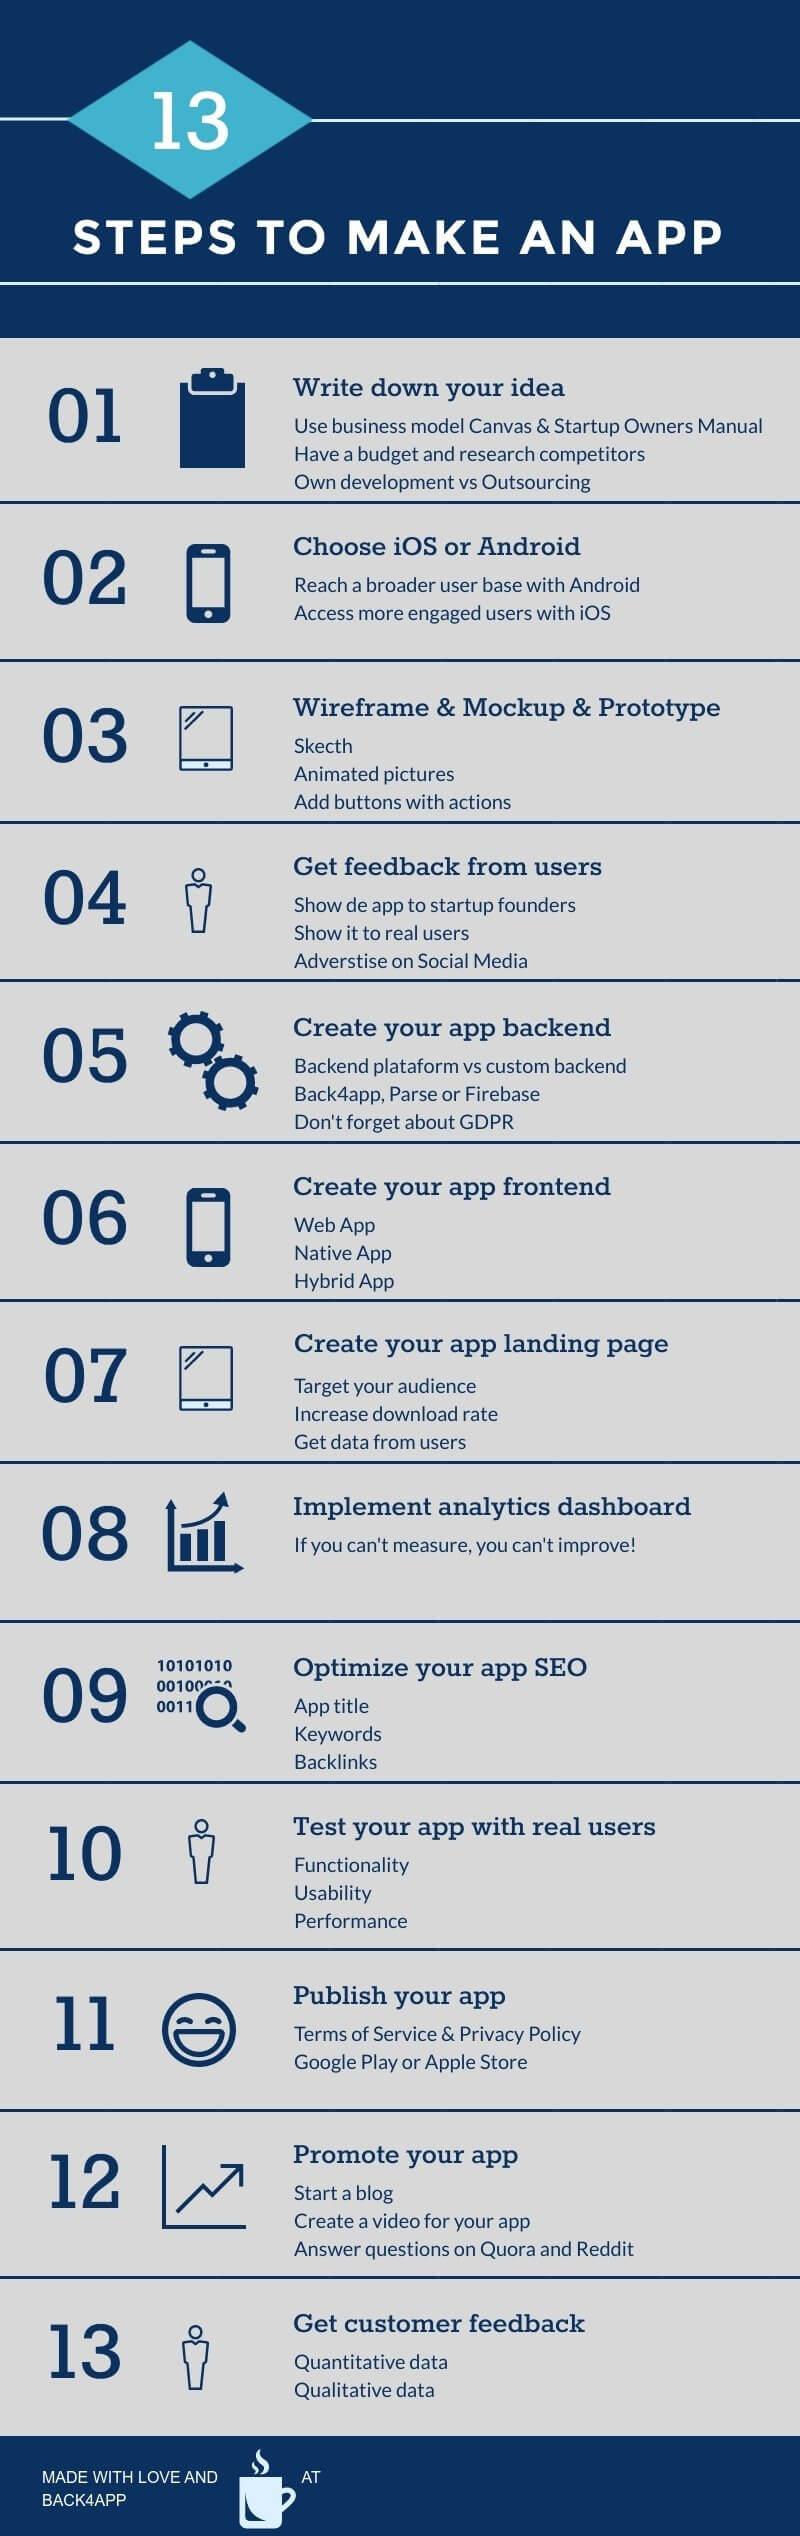 13-Steps-to-make-an-app